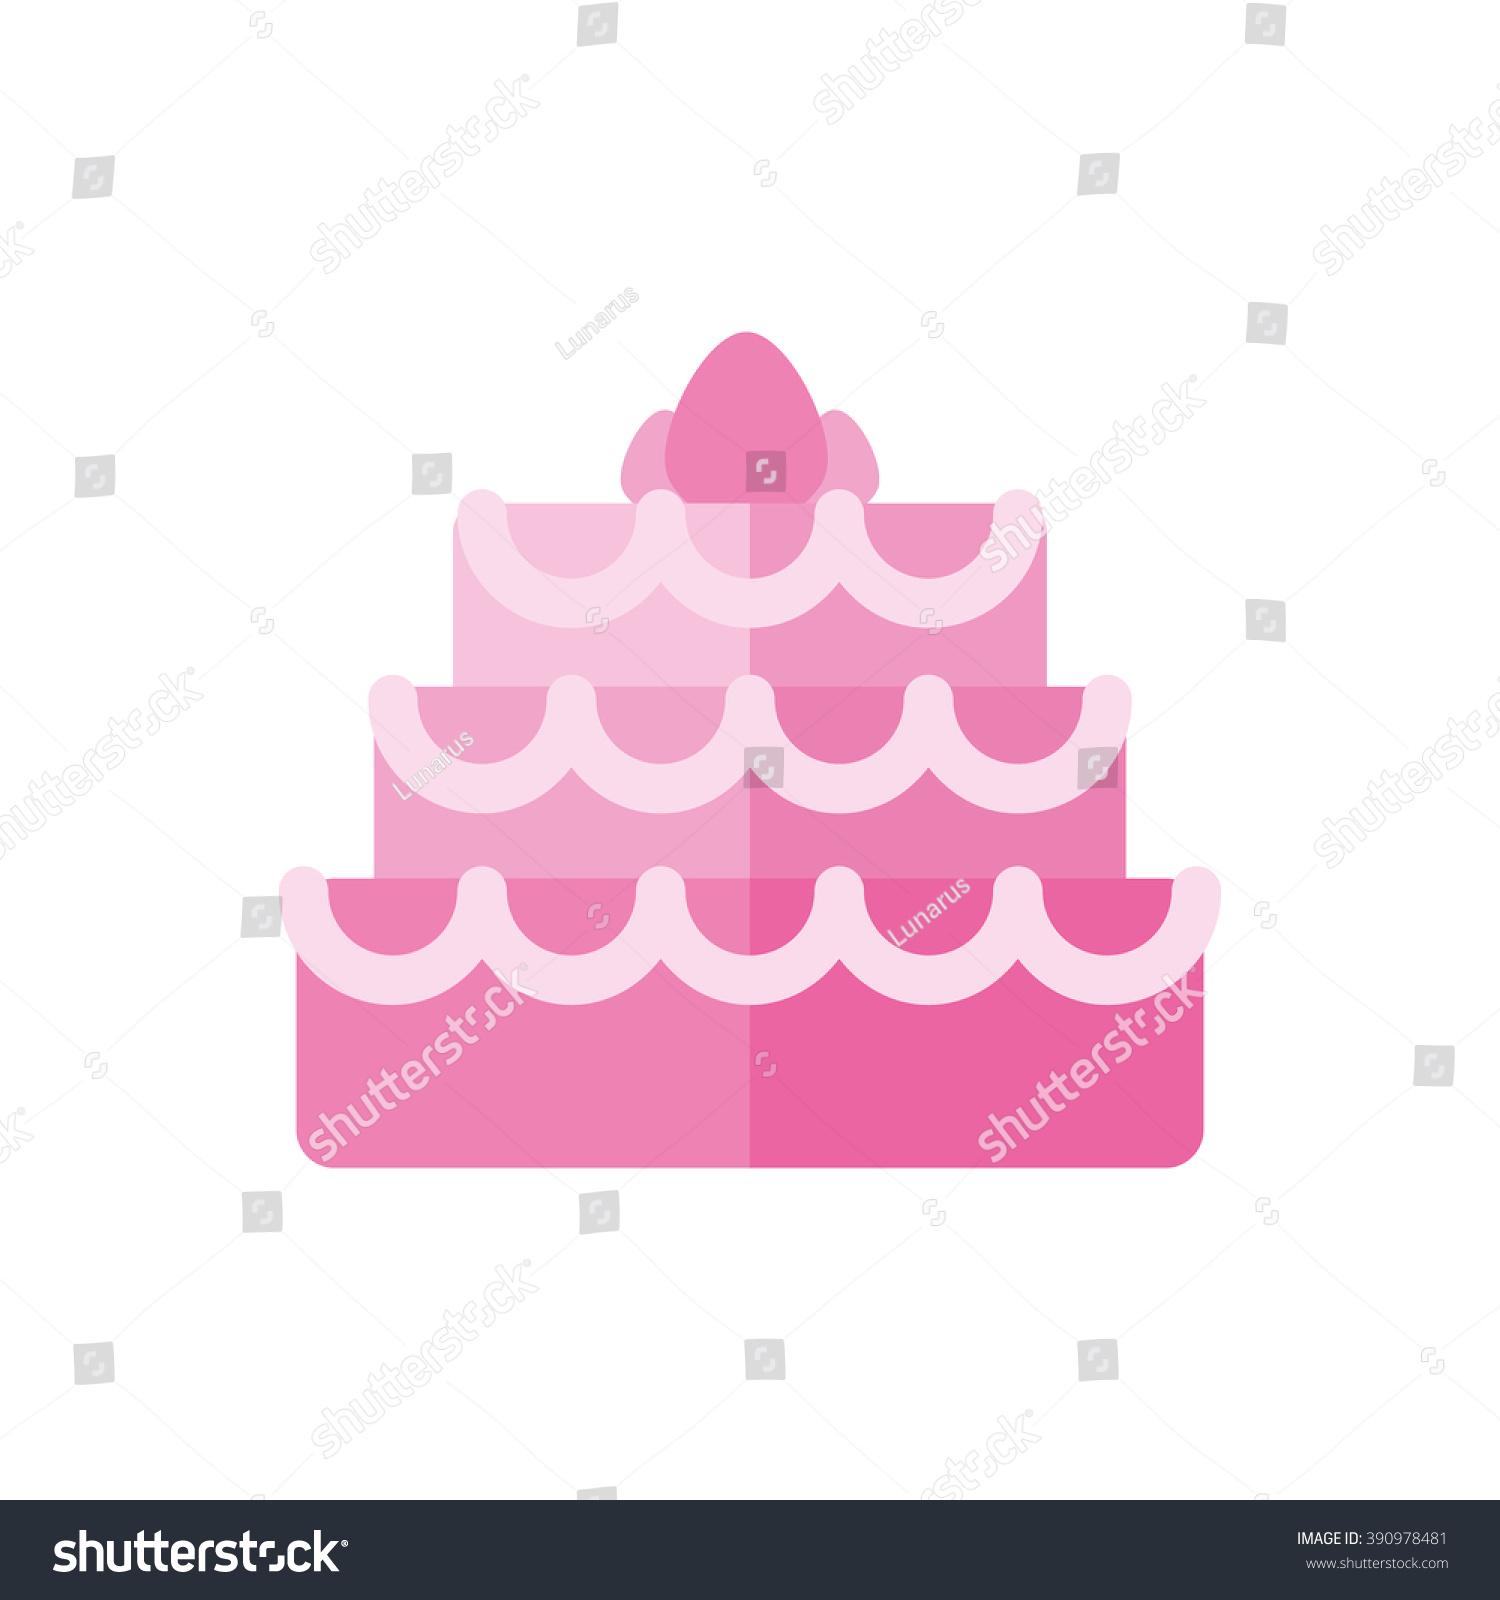 Outstanding 100 Facebook Birthday Cake Symbol Happy Birthday Cake With Name Funny Birthday Cards Online Inifodamsfinfo